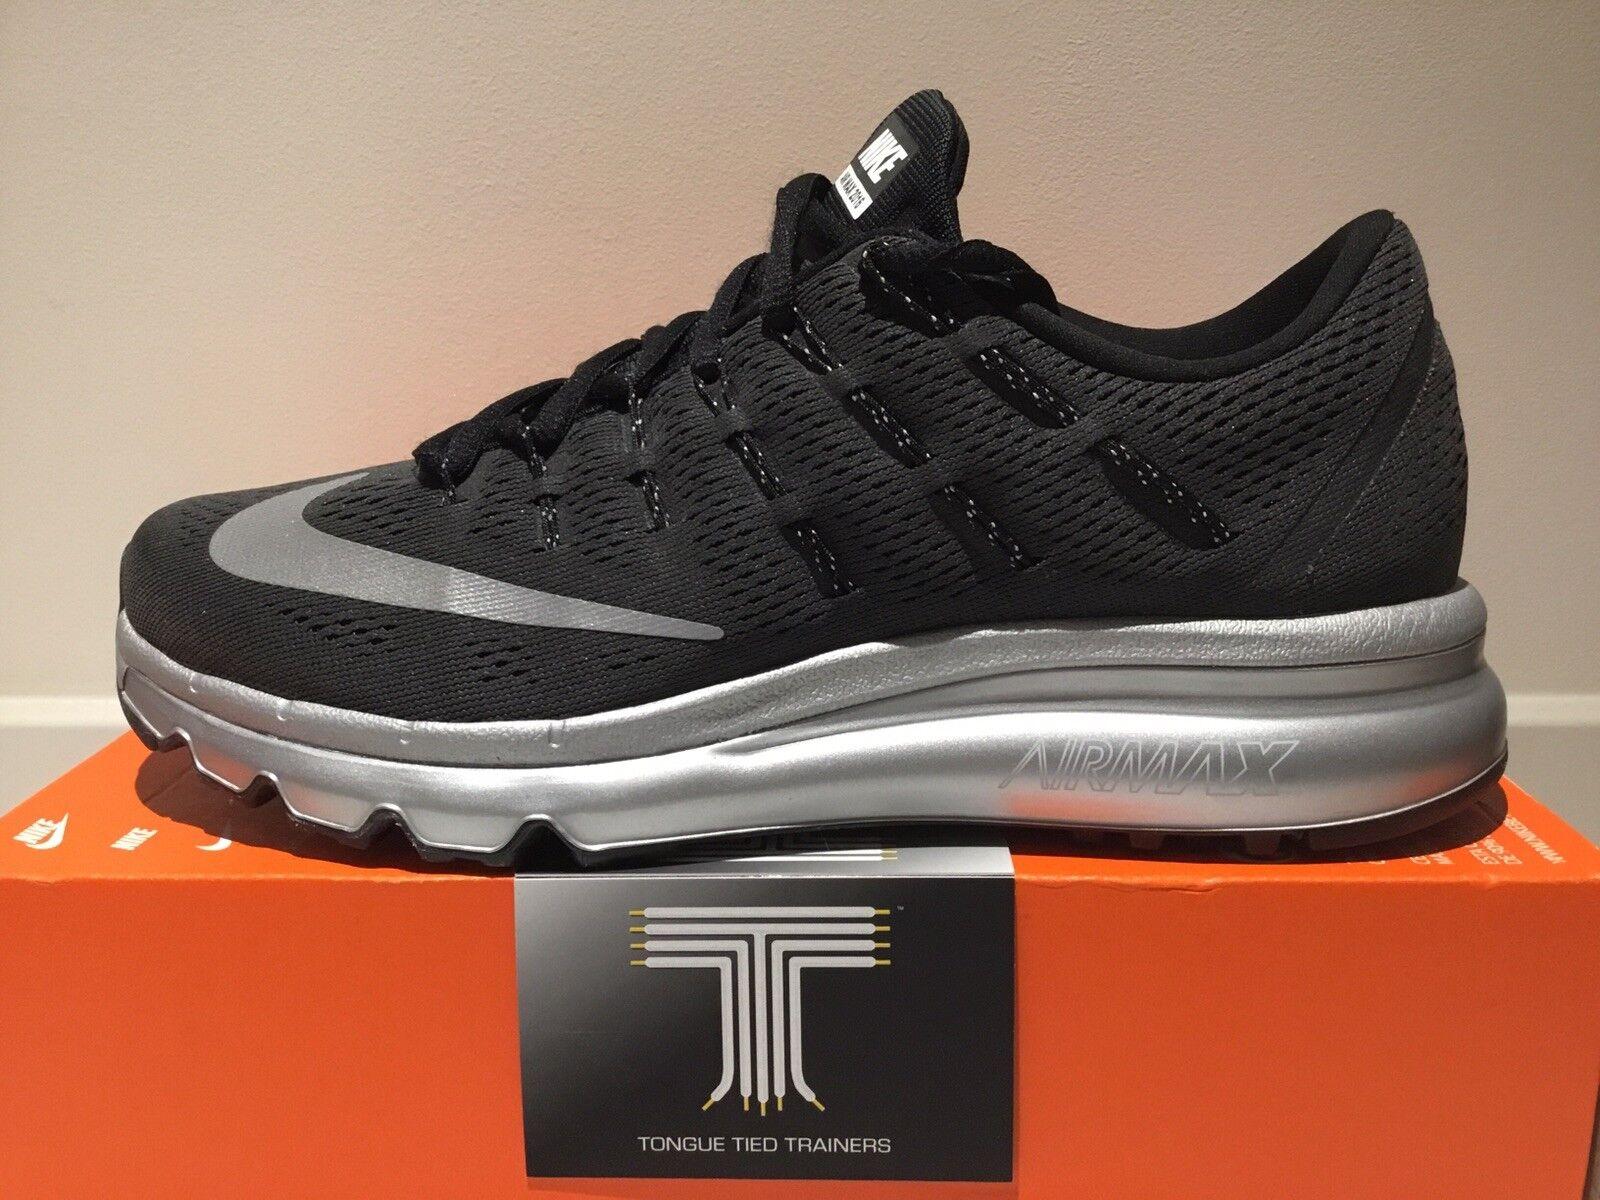 Nike Air Max 2016 Premium Reflective  810886 001  Uk Größe 5.5